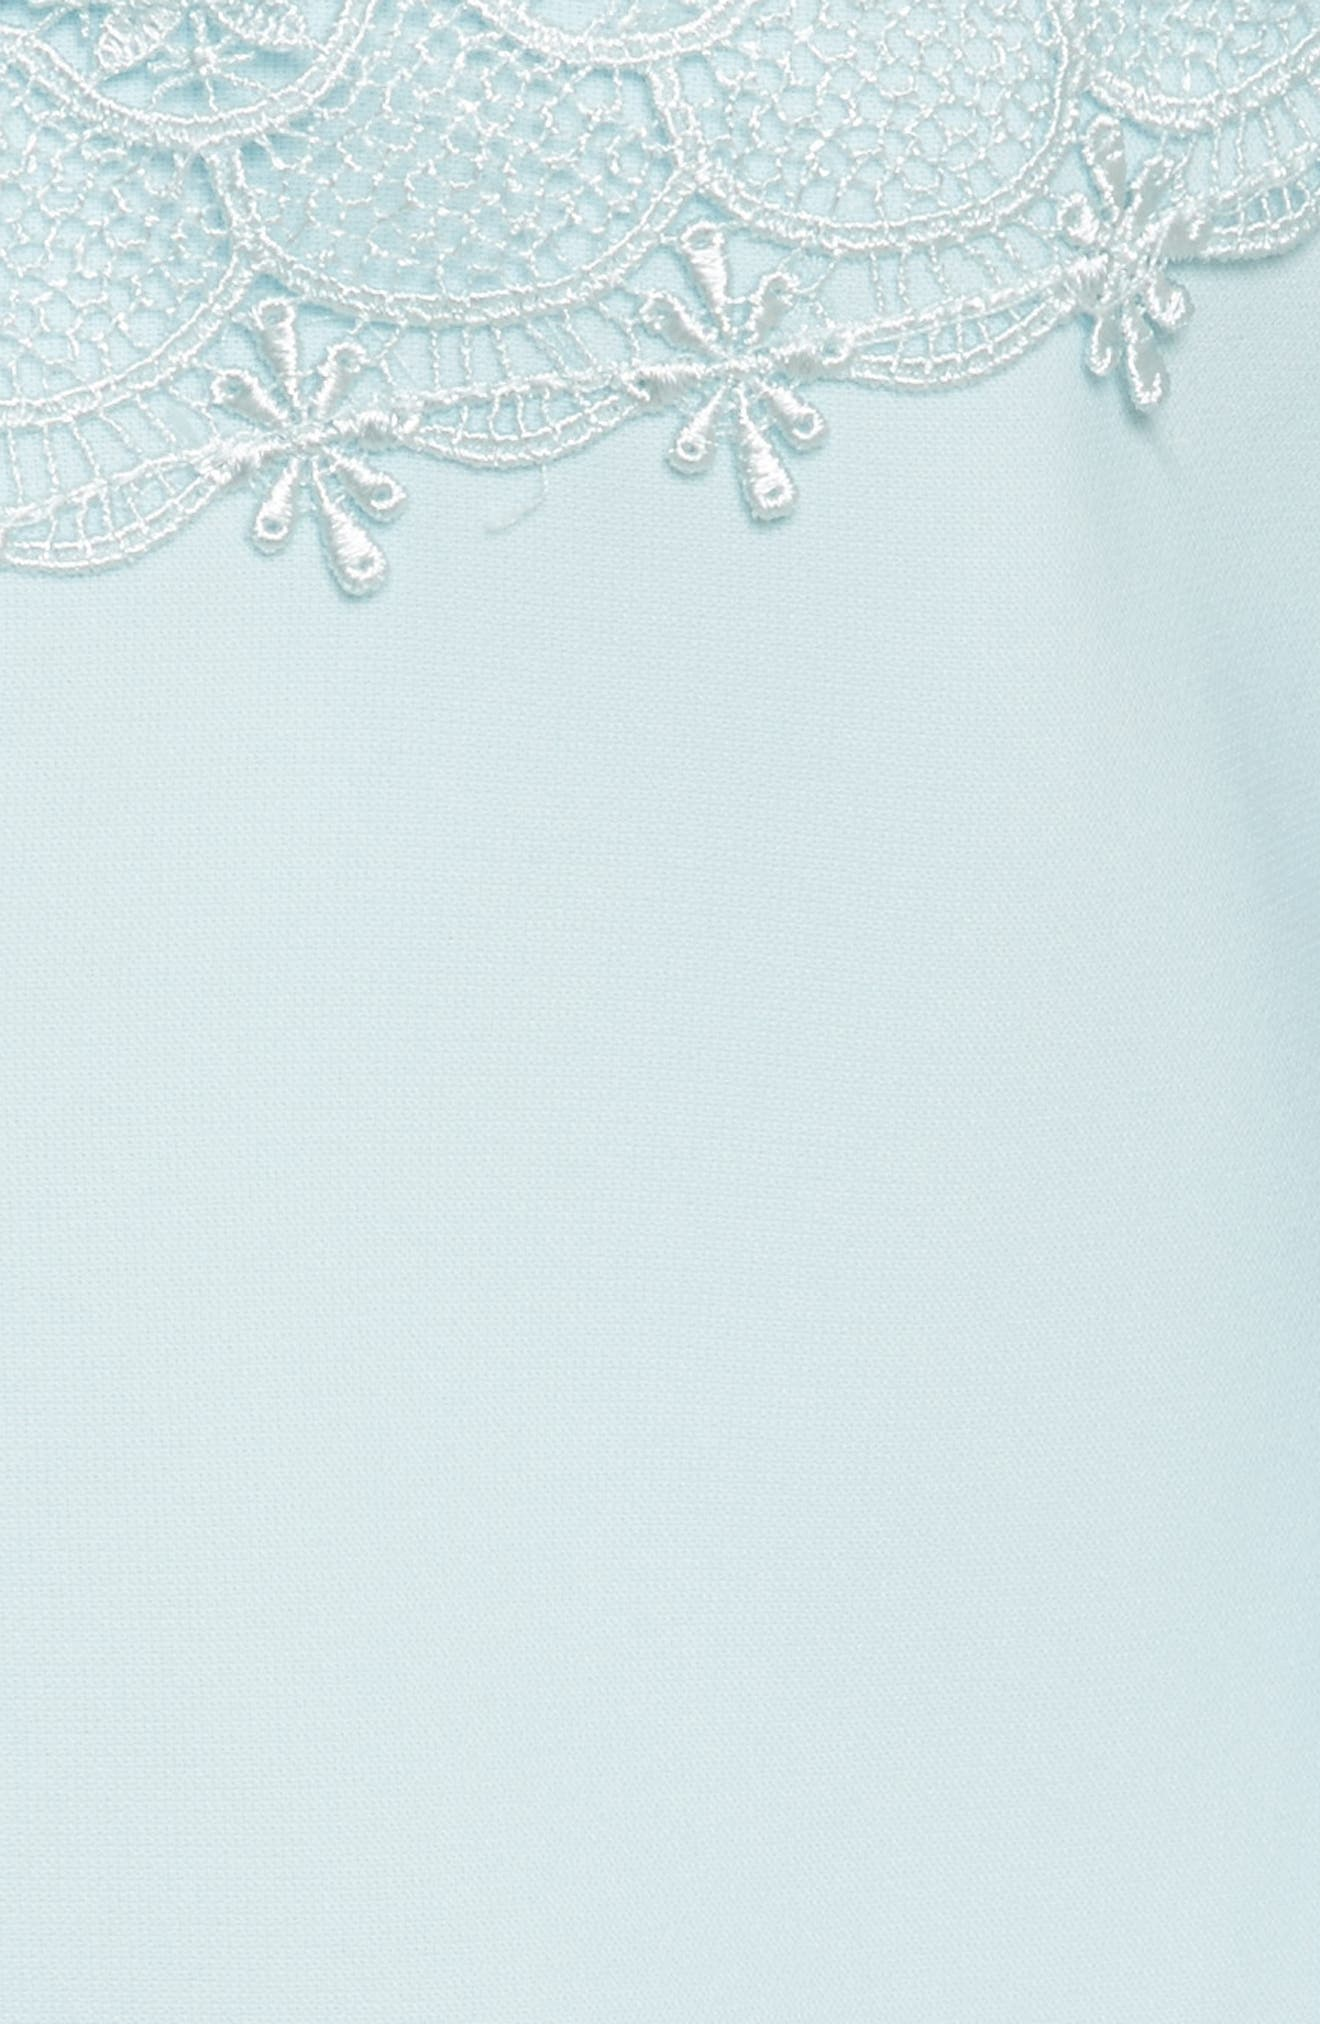 Raechal Lace Sleeve A-Line Dress,                             Alternate thumbnail 5, color,                             451